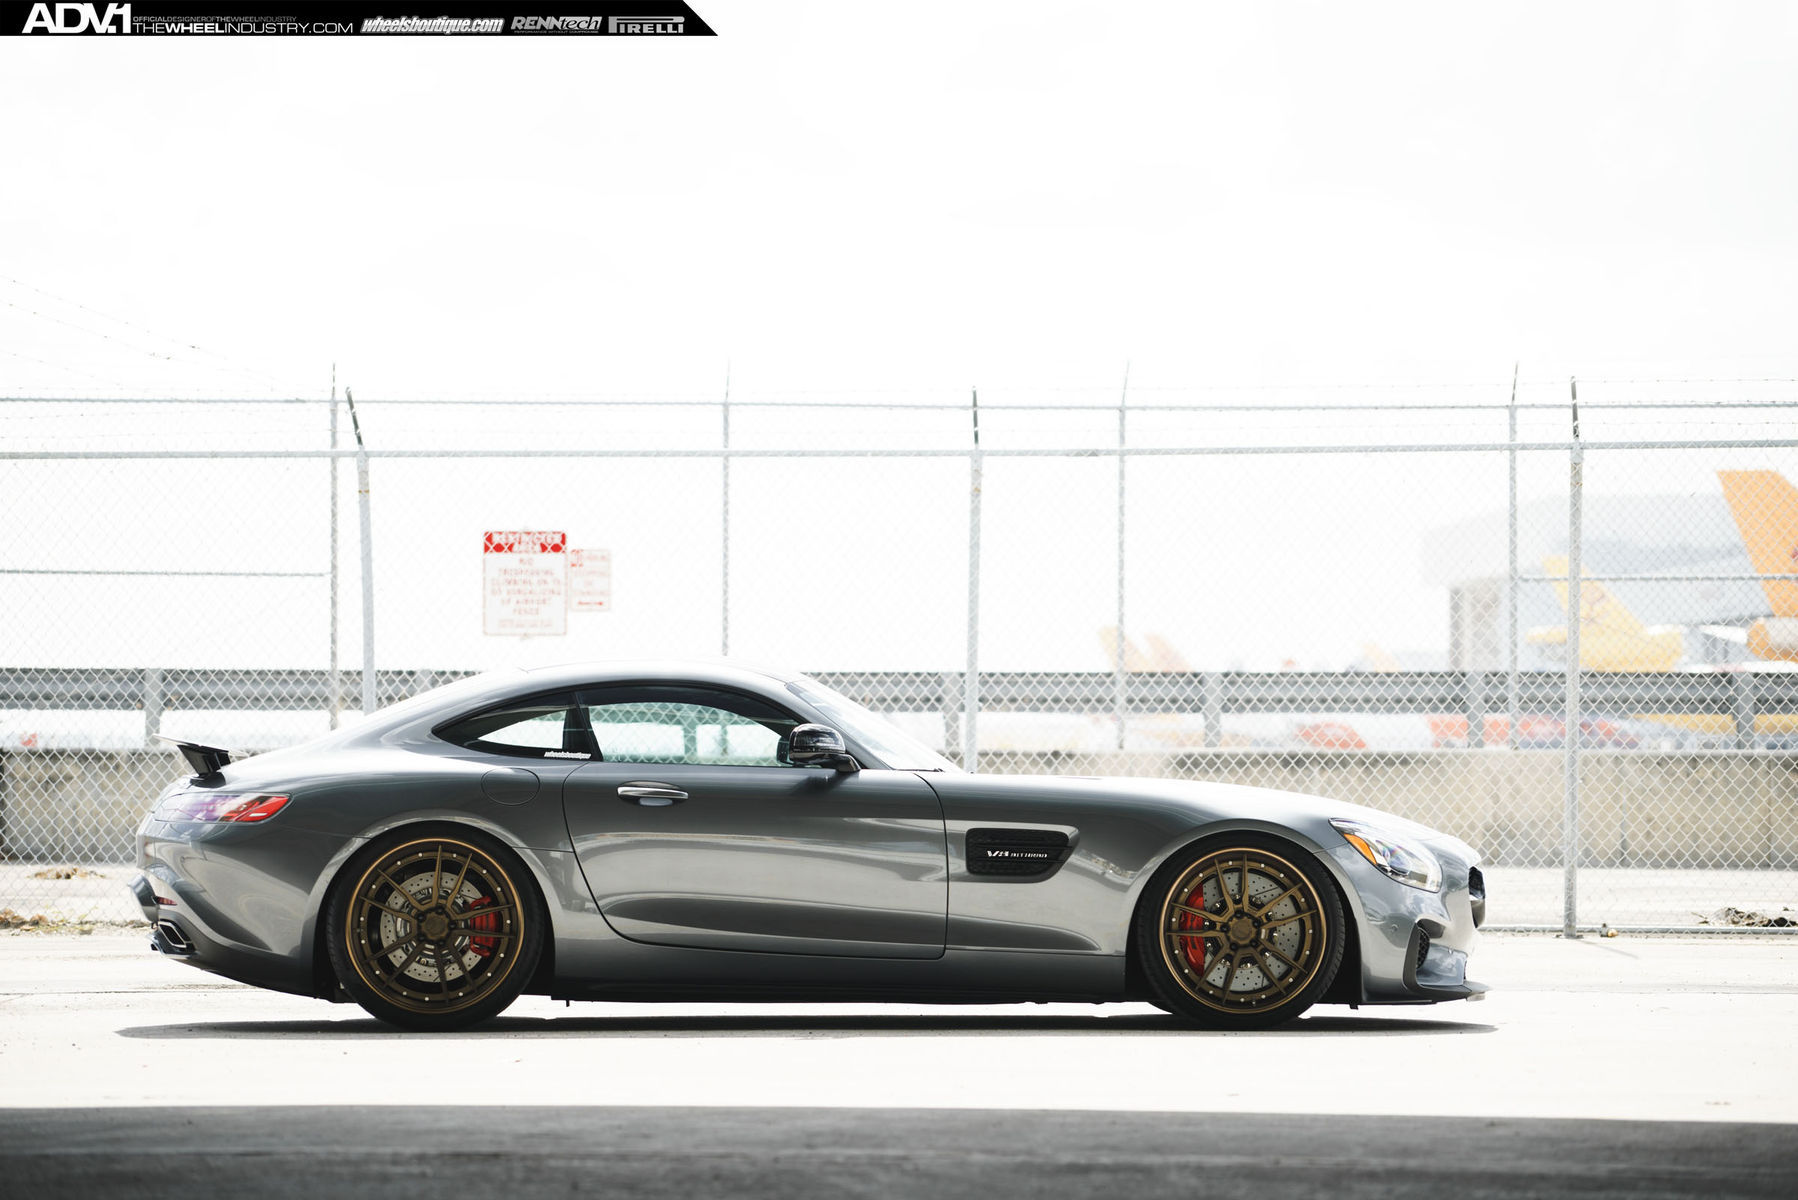 2016 Mercedes-Benz    ADV1 Mercedes AMG GT-S Edition 1